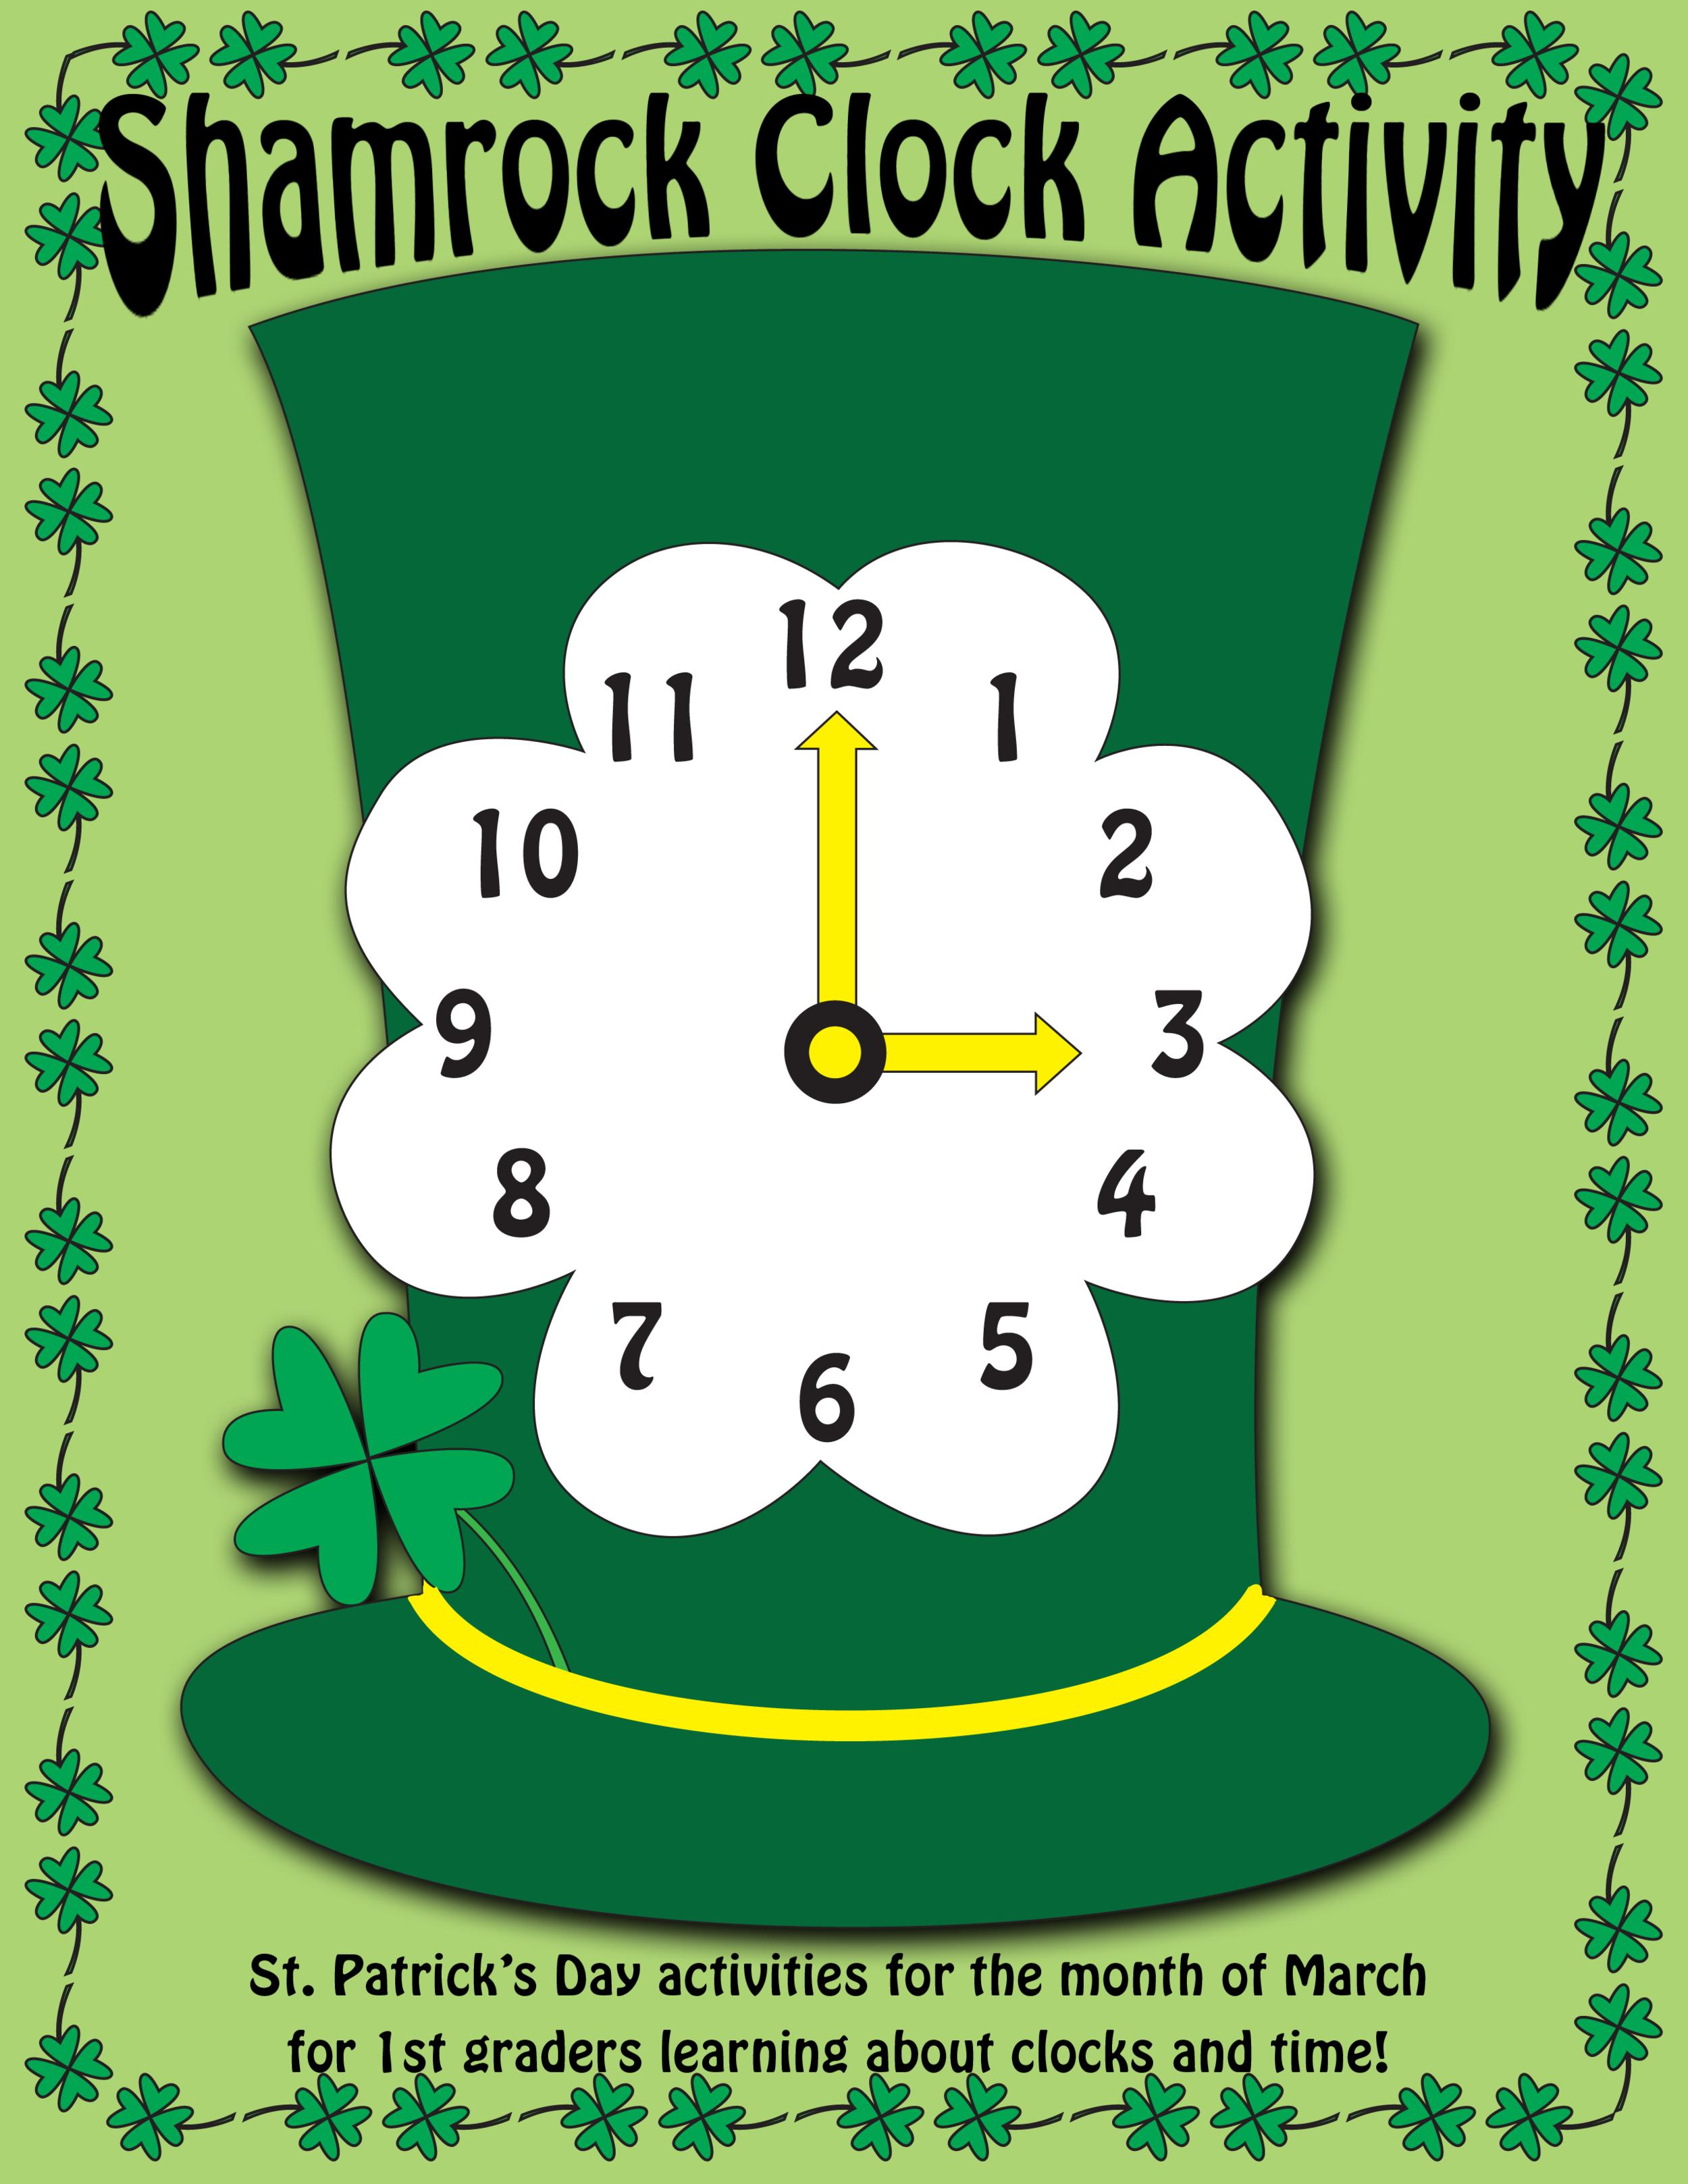 Shamrock Clock